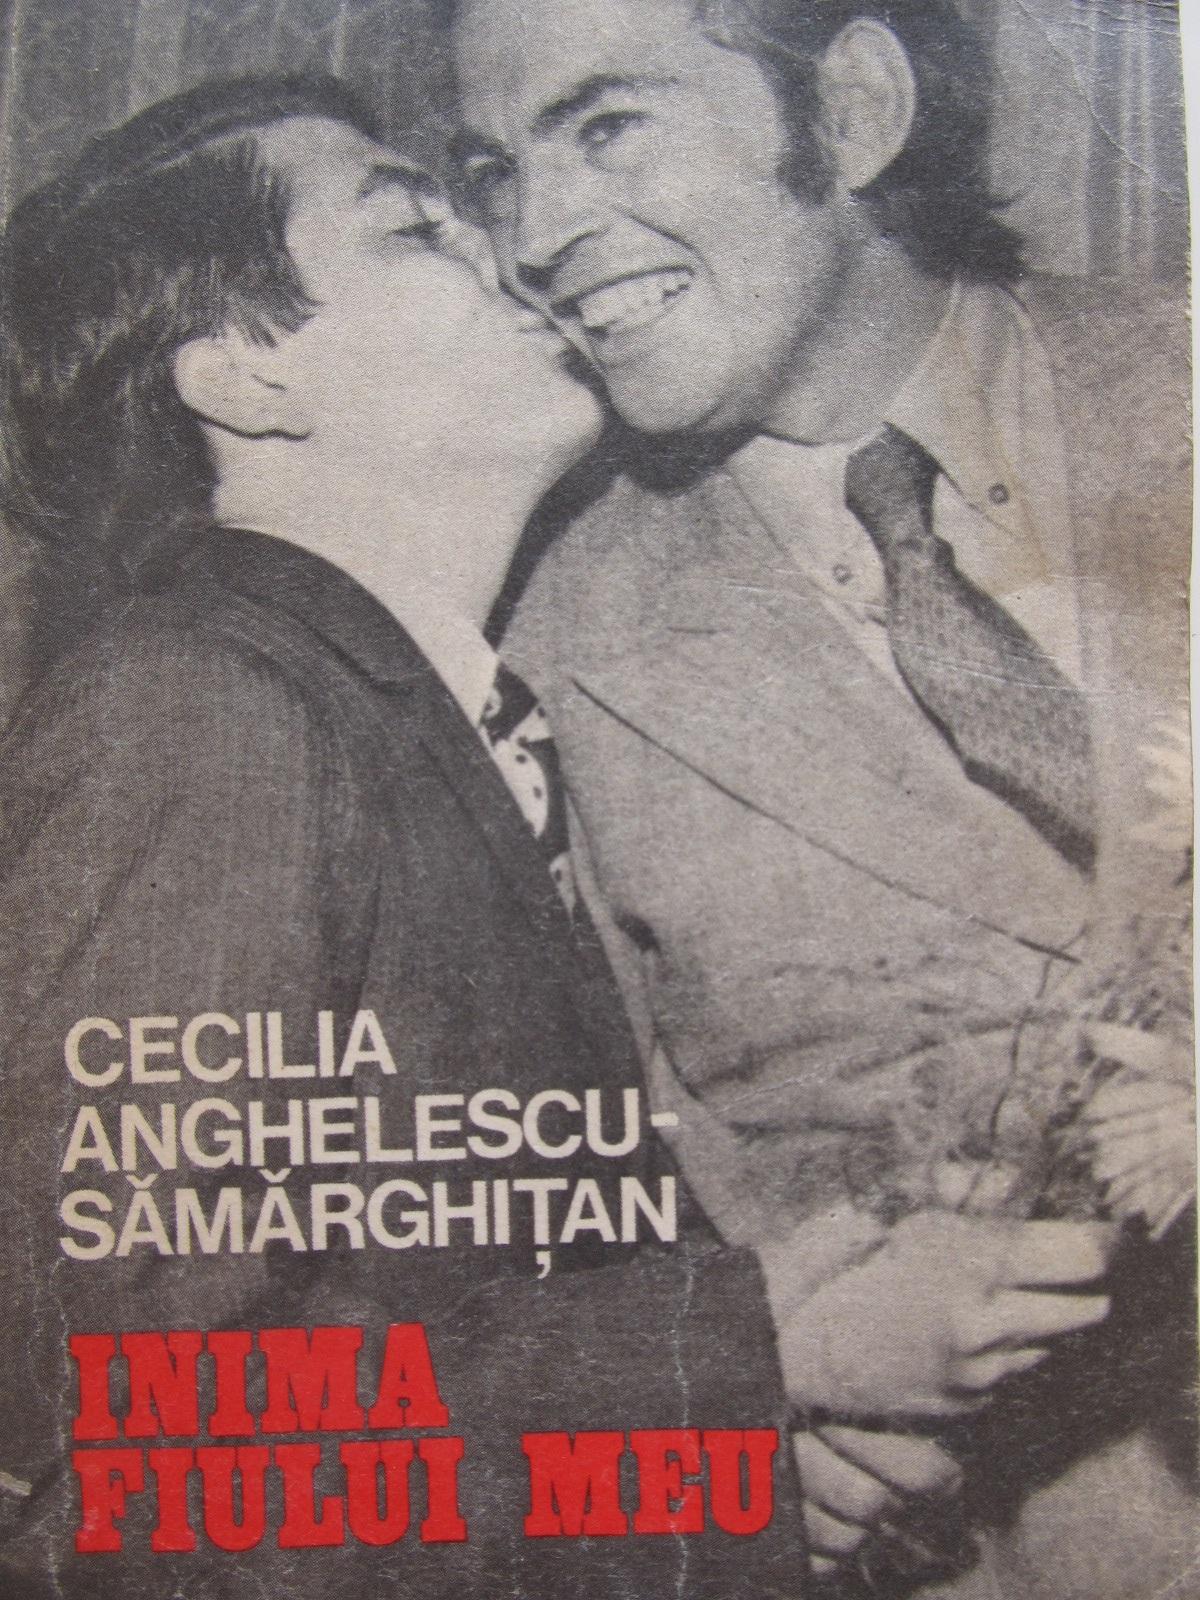 Inima fiului meu - Ceclia Anghelescu Samarghitan | Detalii carte